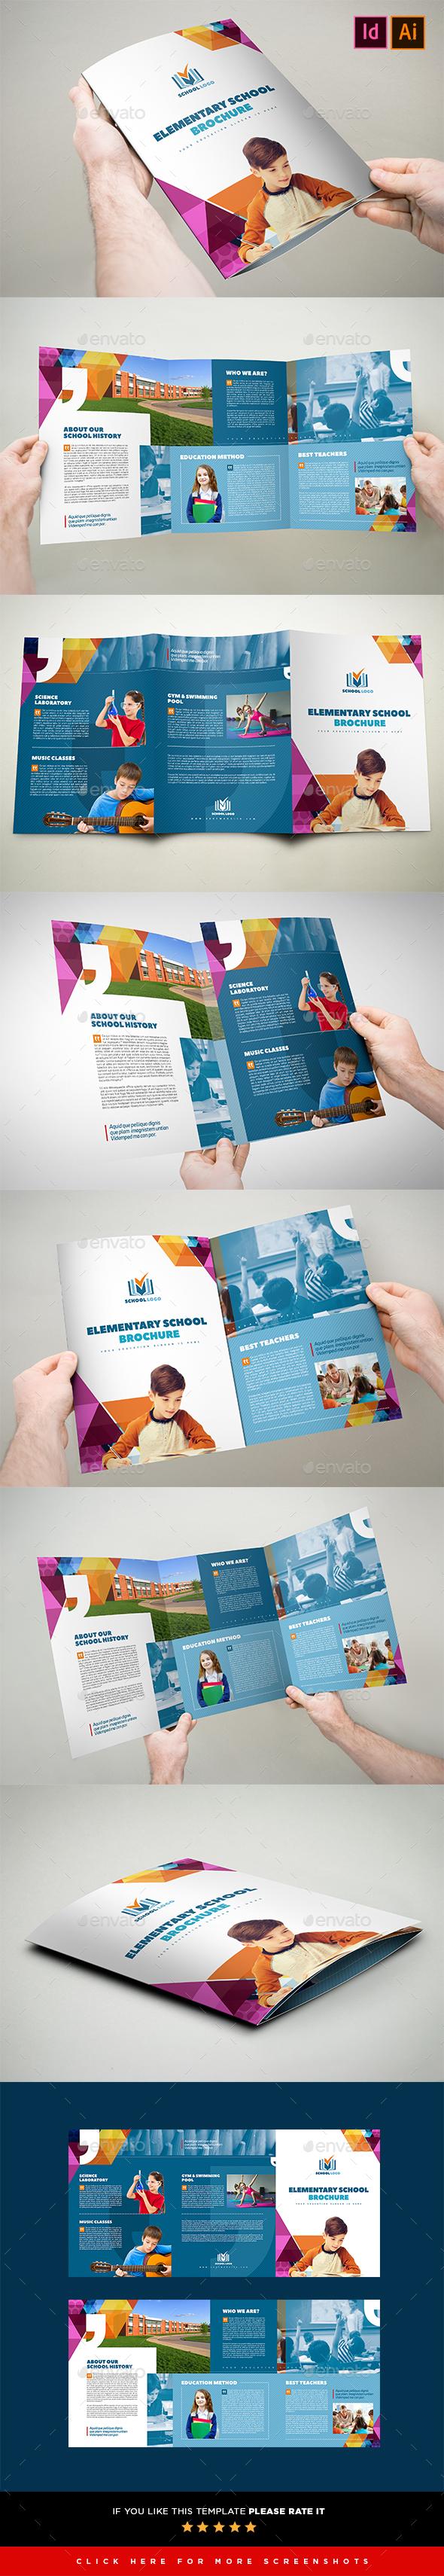 3xA4 Tri-Fold School / Multipurpose Brochure Template - Corporate Brochures